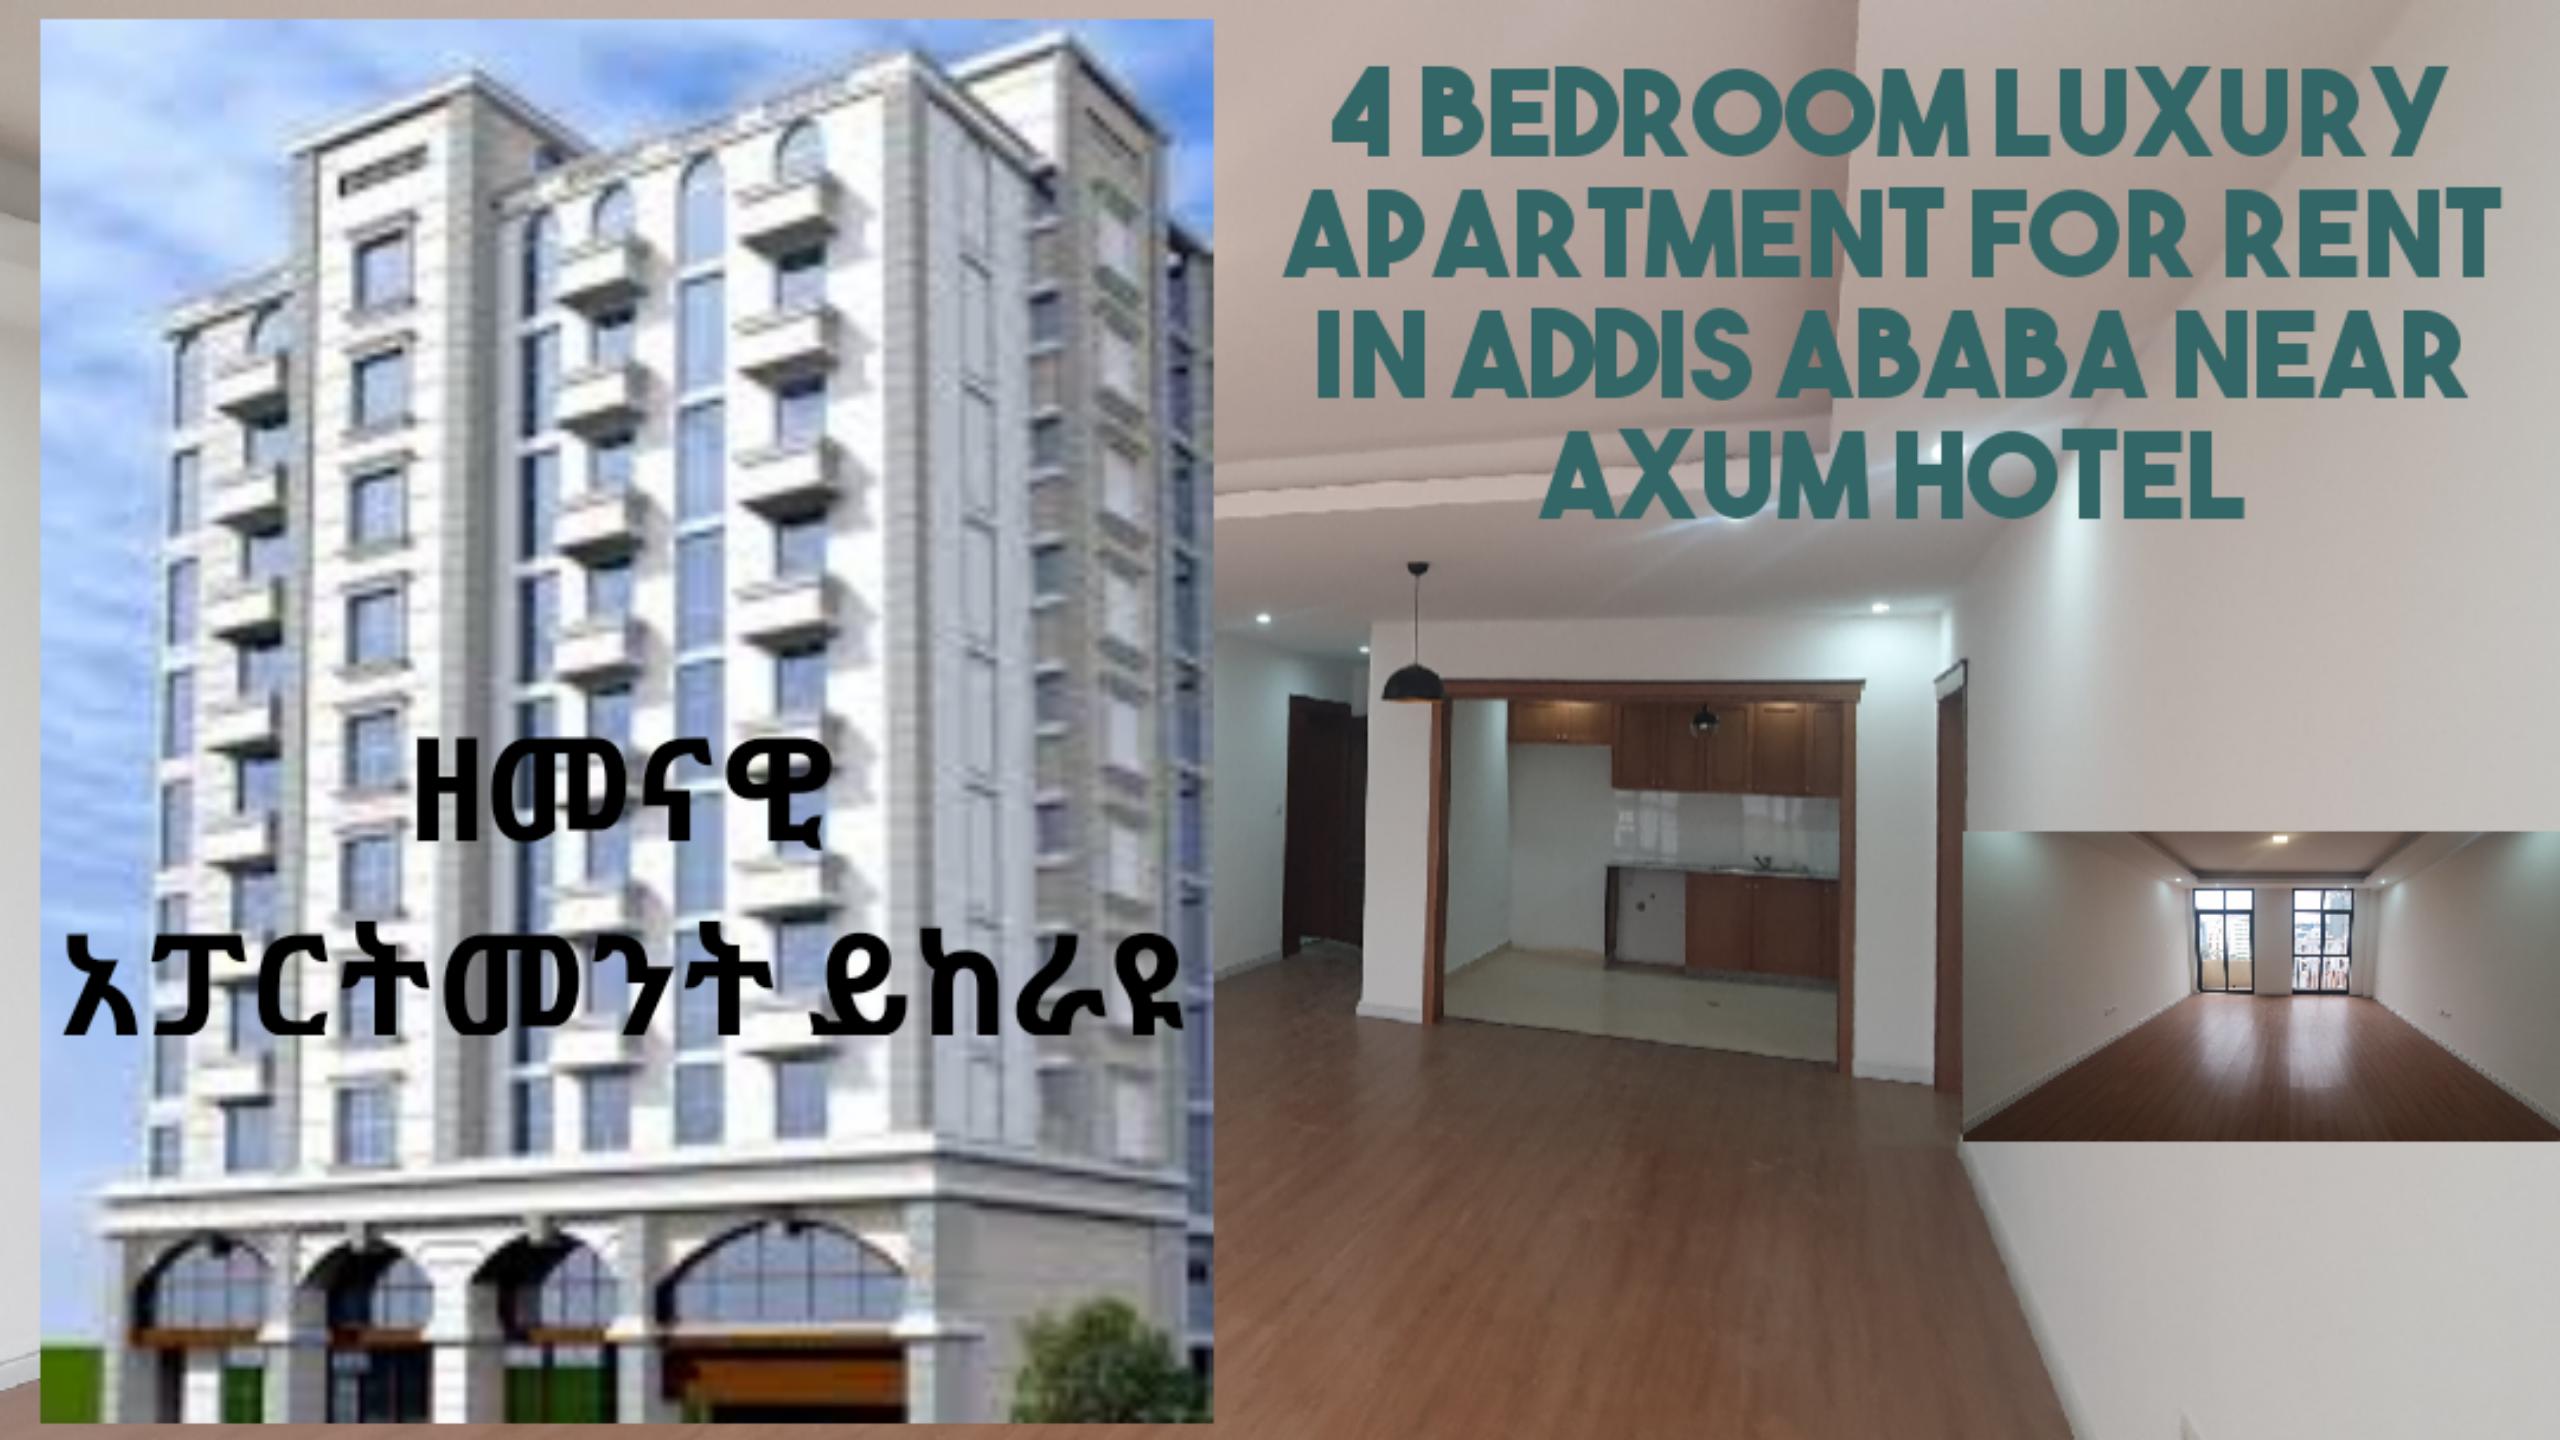 4 Bedroom Luxury Apartment For Rent Near Axum Hotel